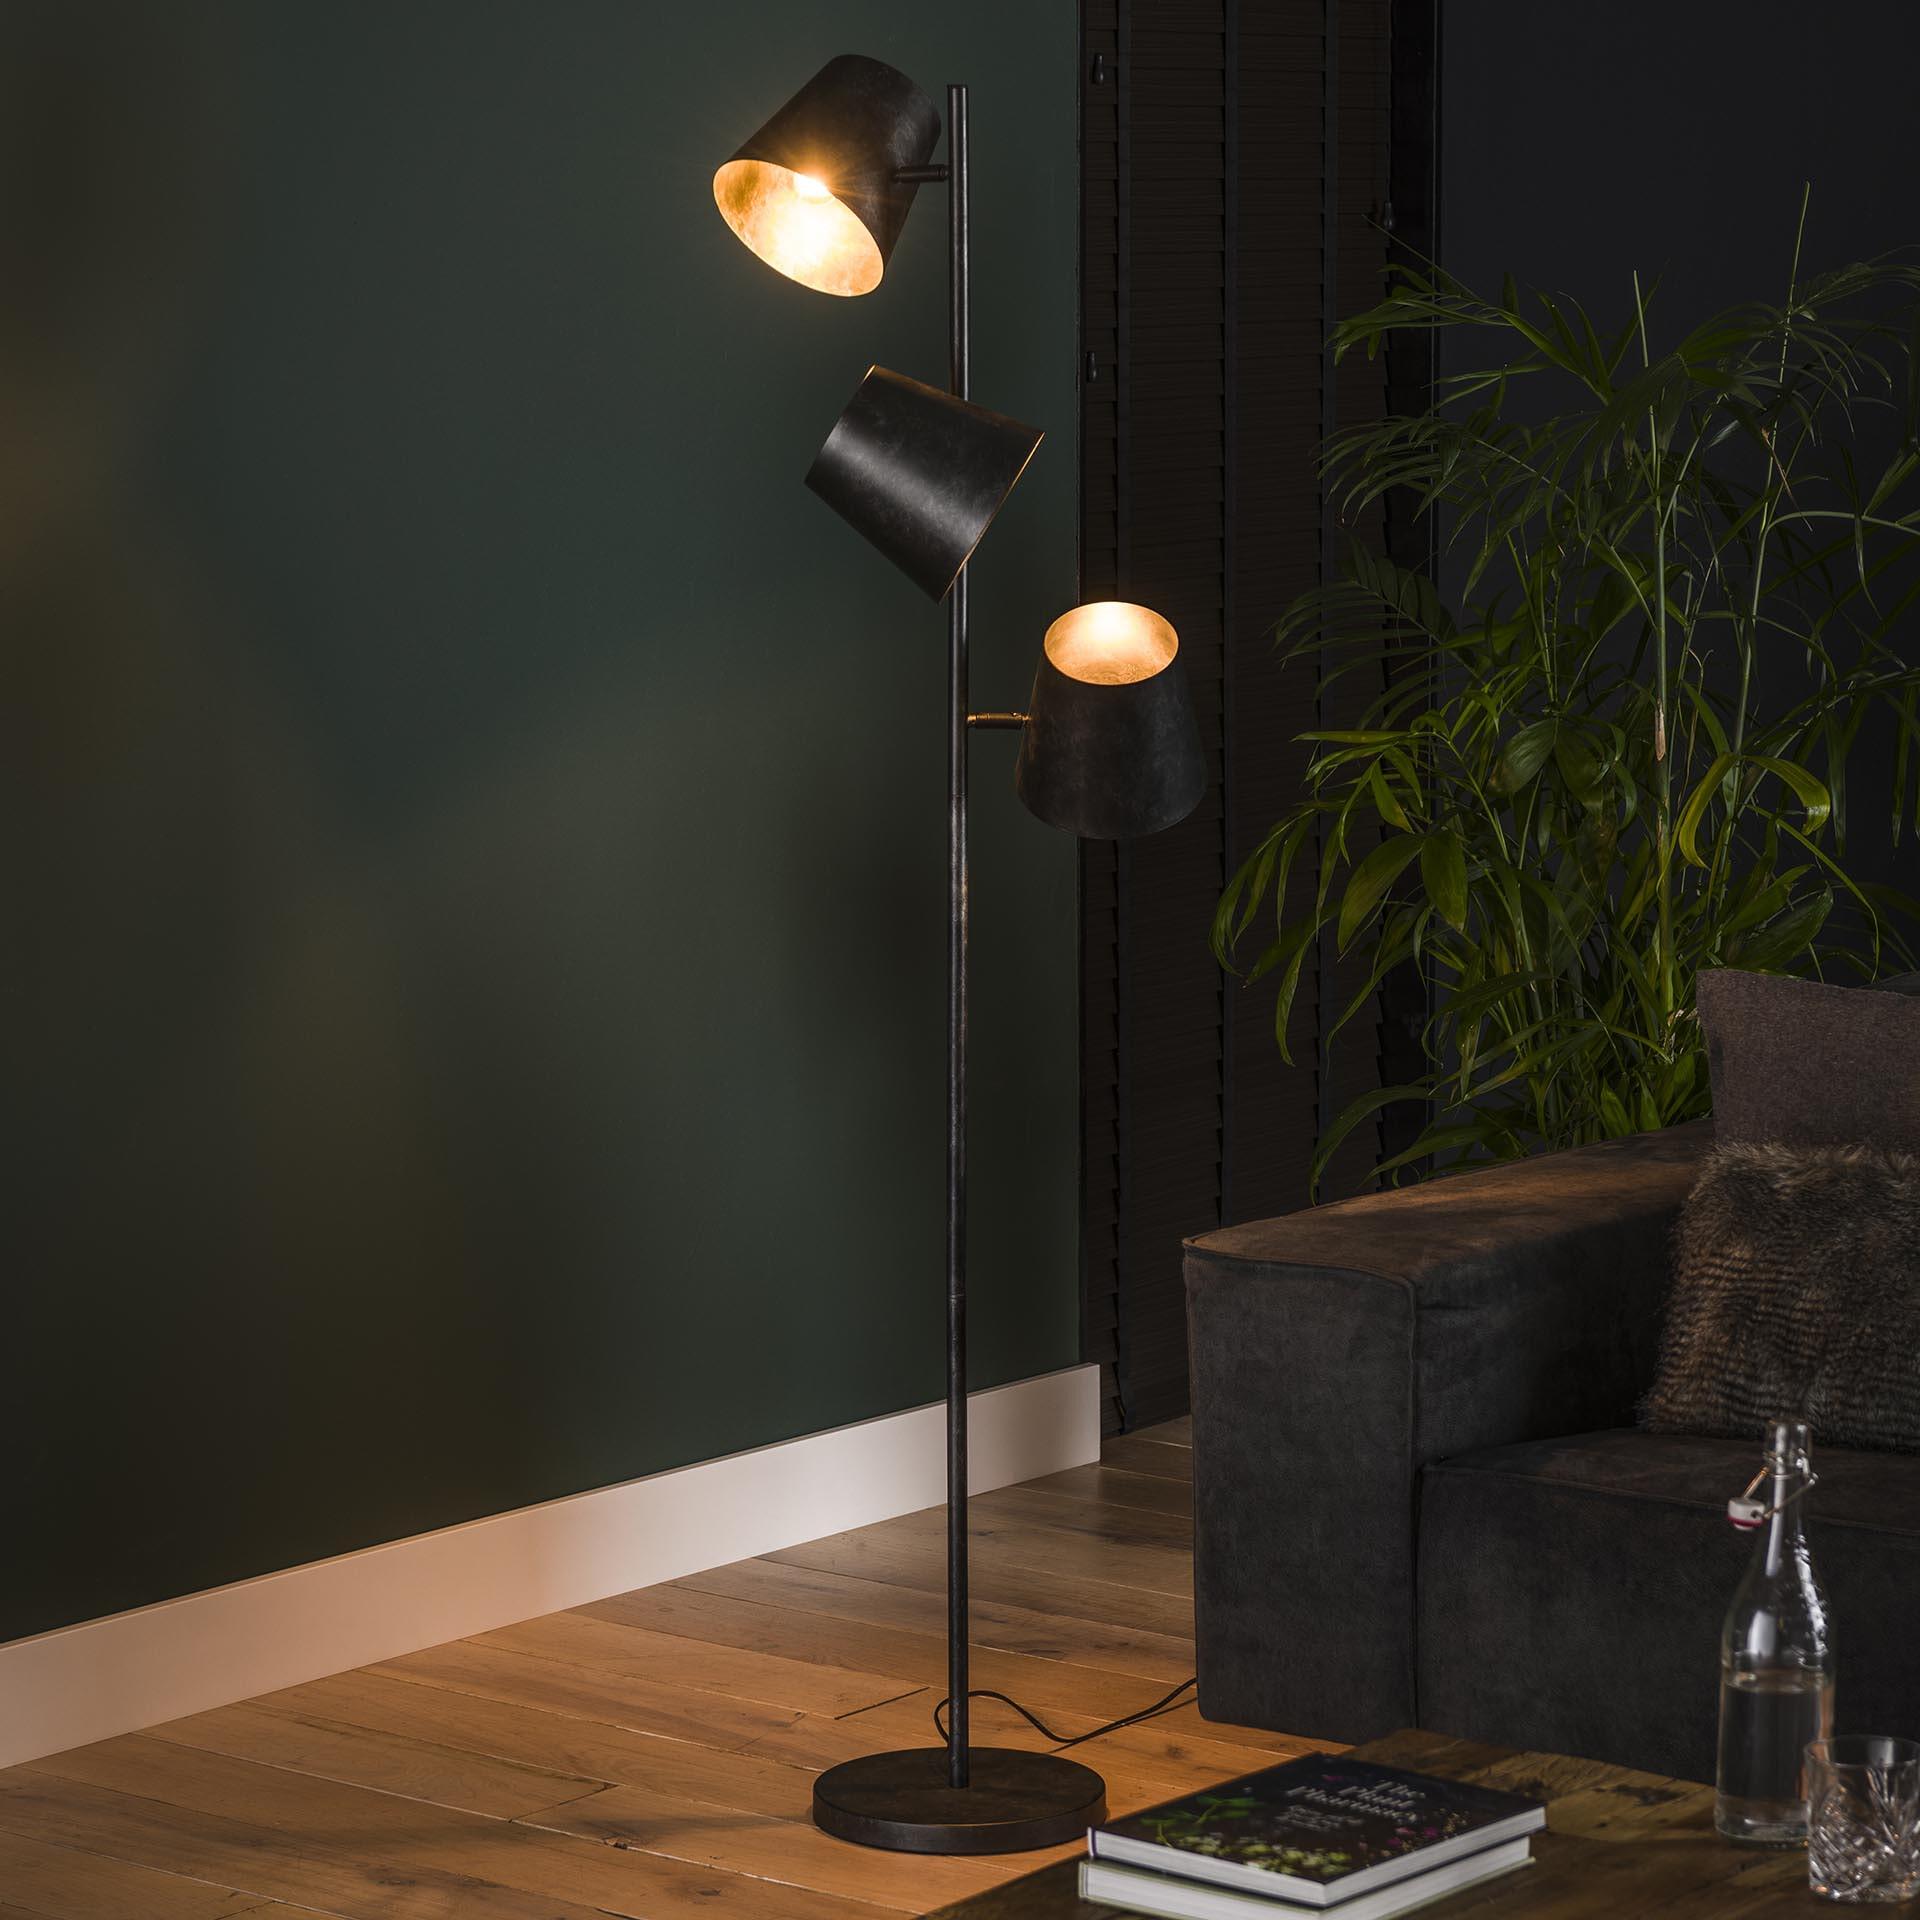 Vloerlamp 'Jo' 3-lamps, Ø18cm, kleur Charcoal